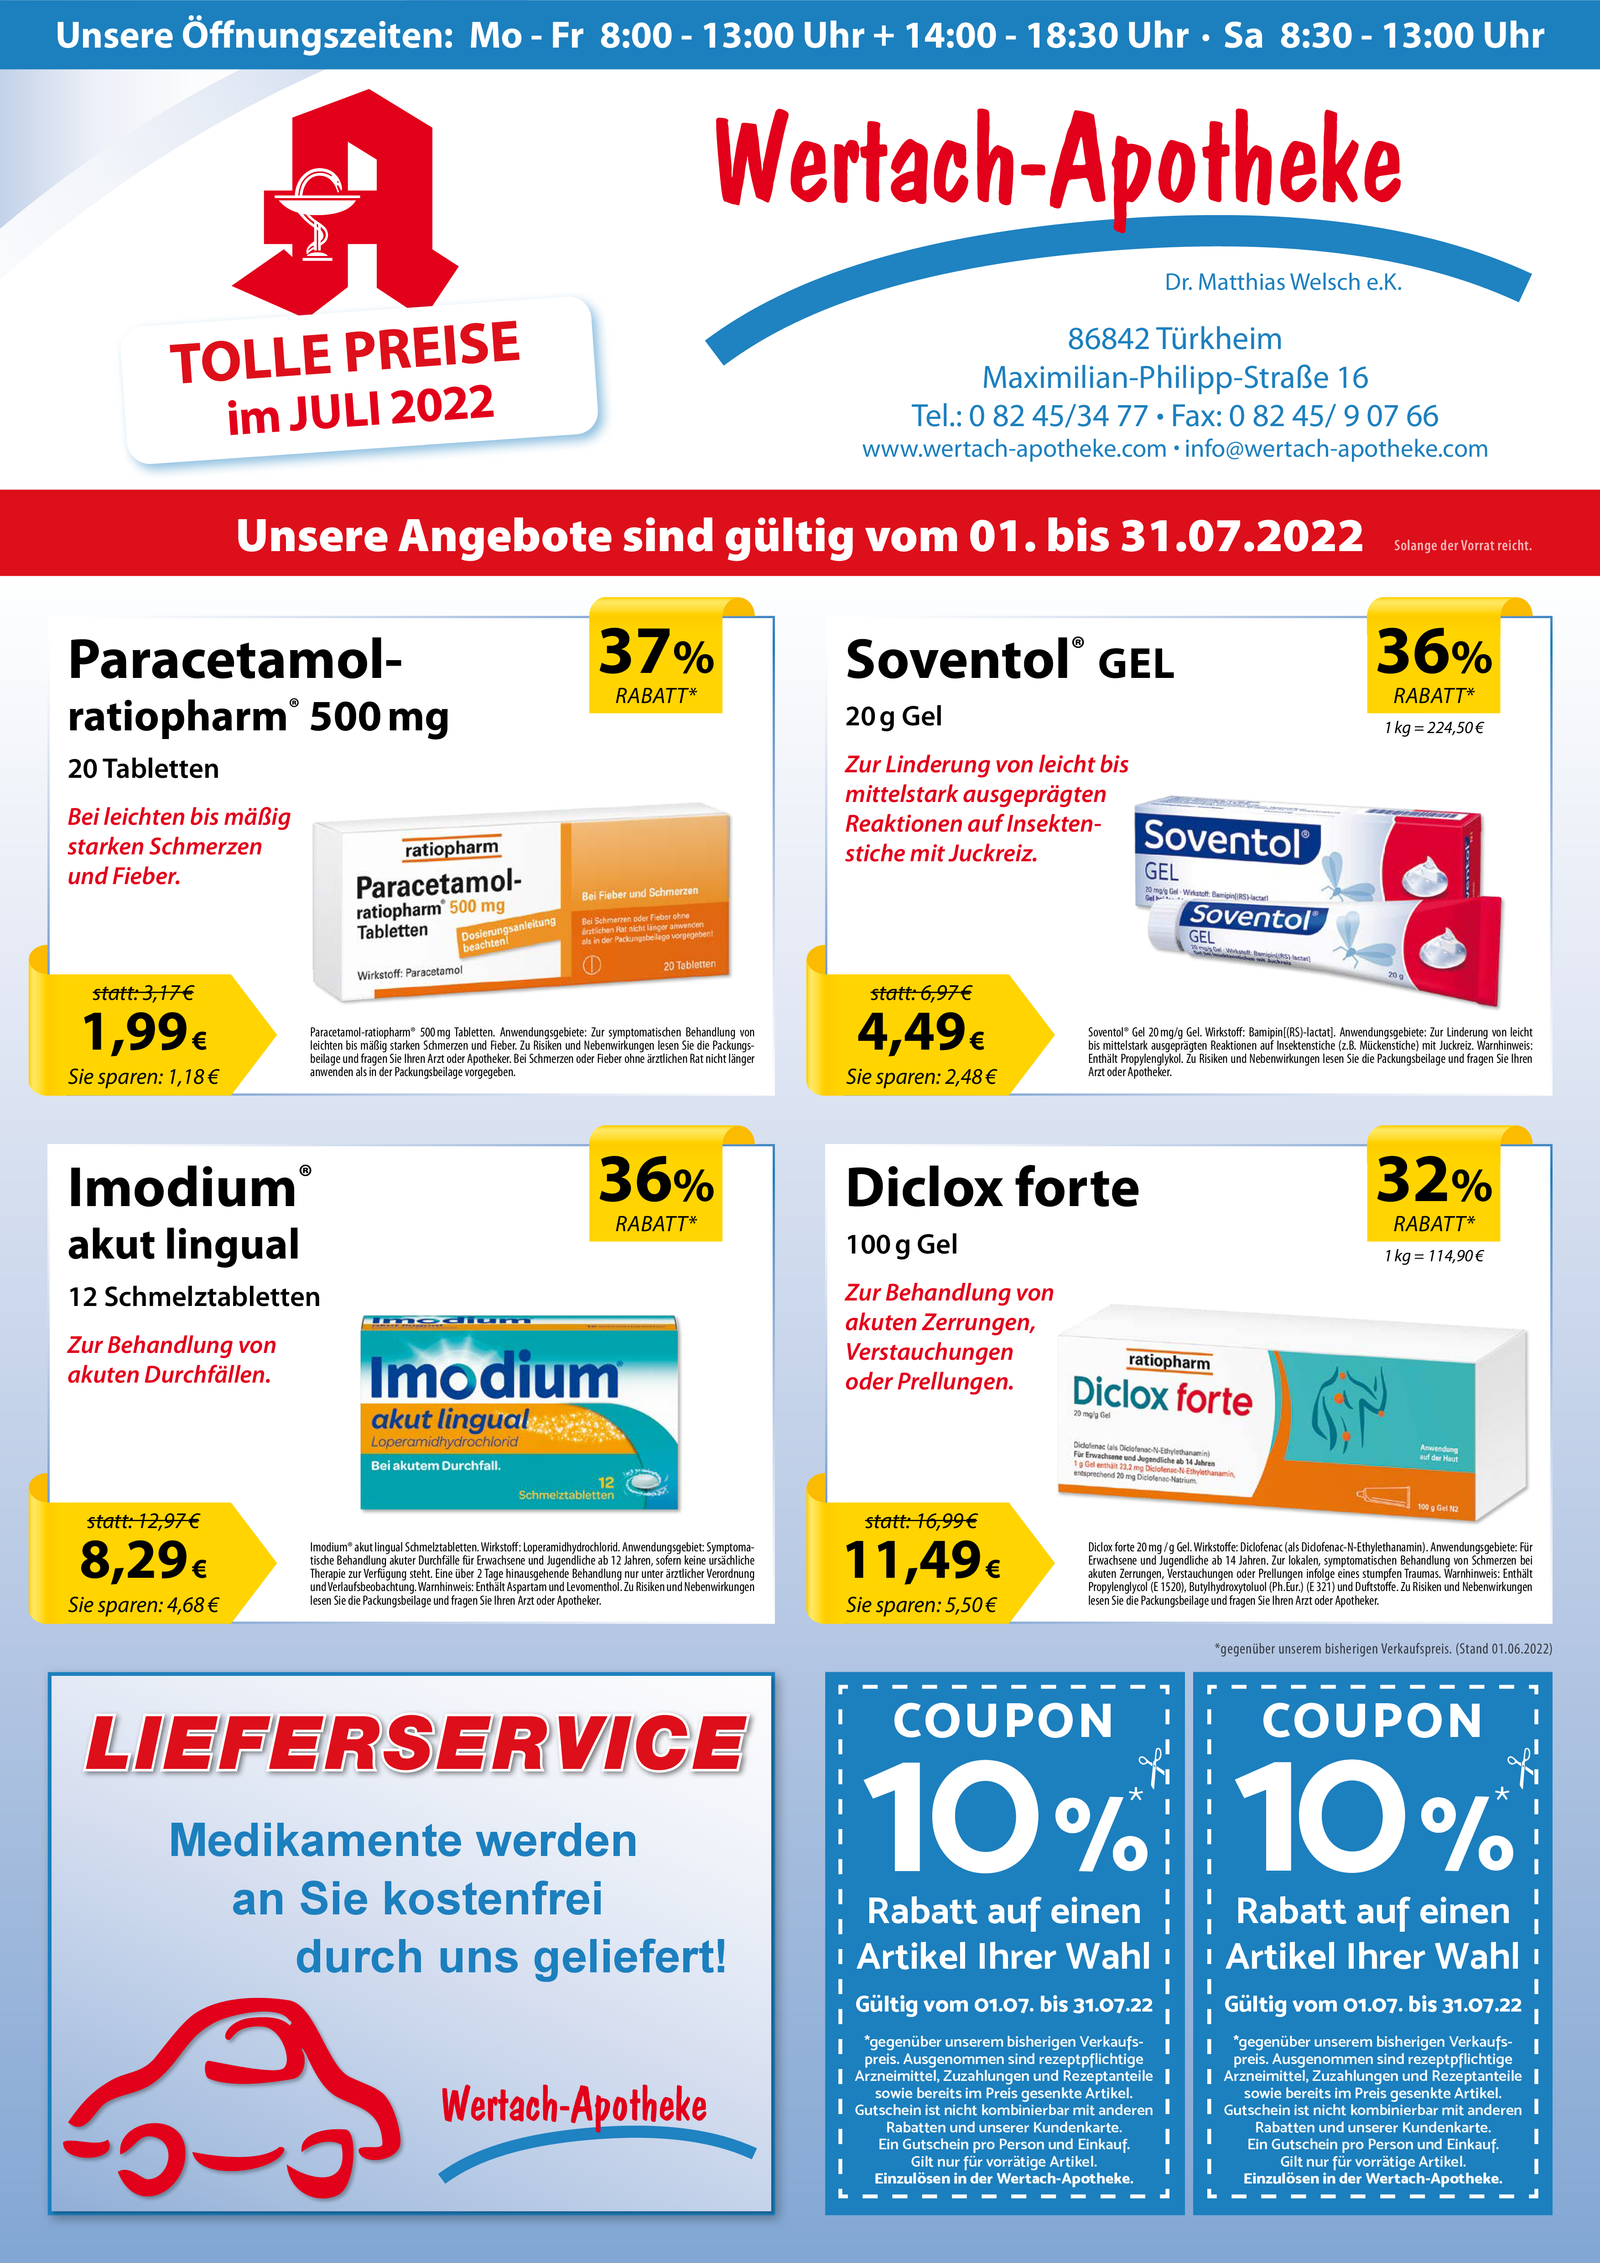 https://mein-uploads.apocdn.net/1028/leaflets/1028_flyer-Seite1.png